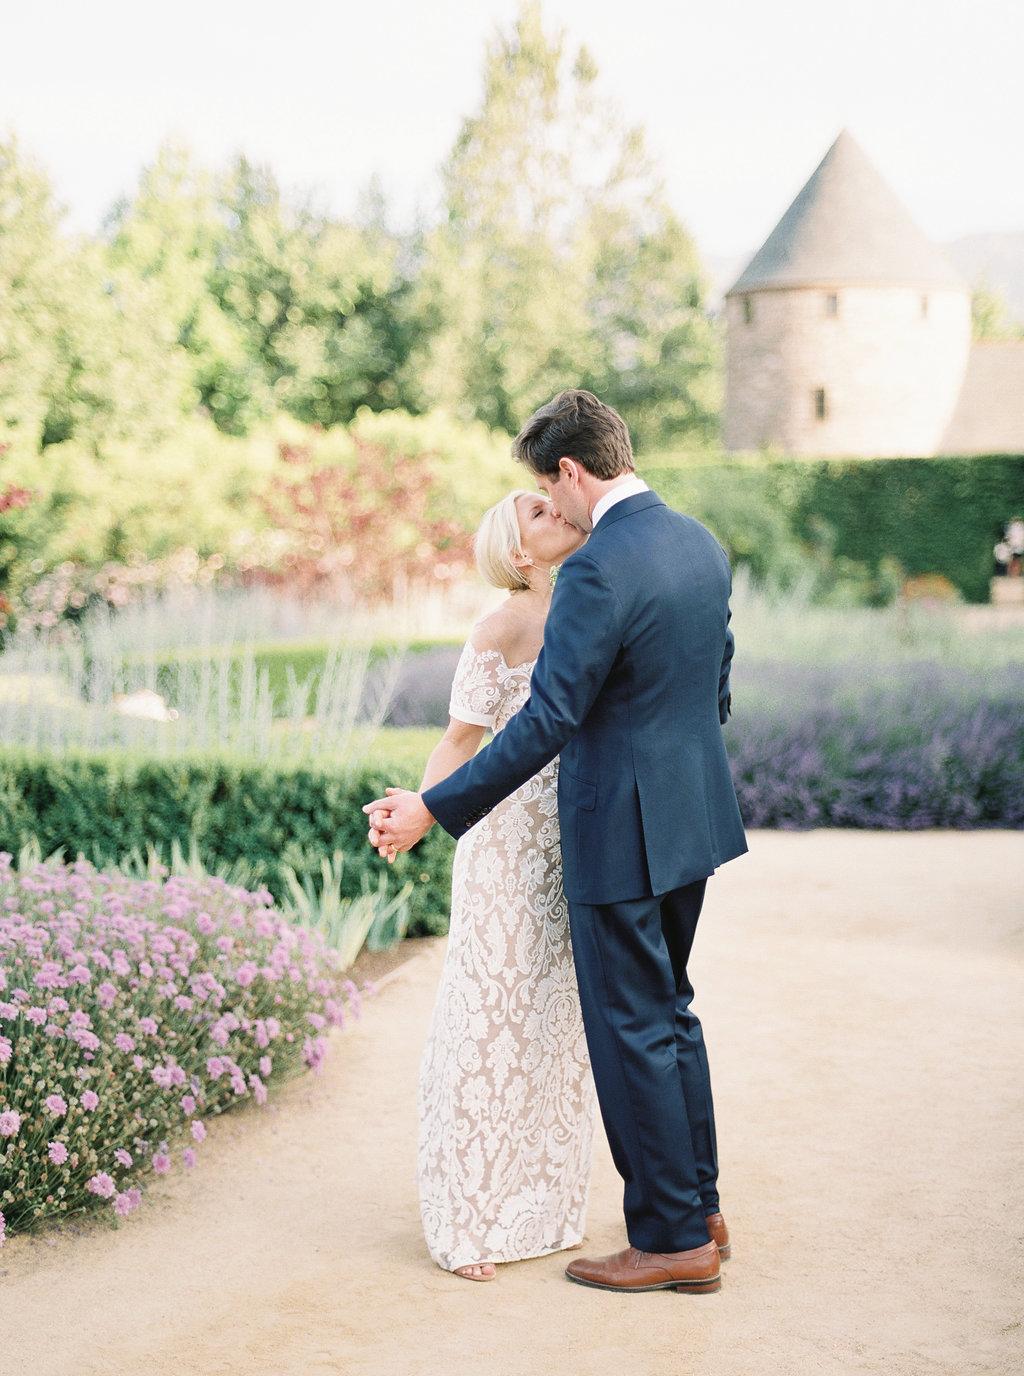 alegria-by-design-wedding-planner-planning-event-design-santa-barbara-day-of-coordinator-kestrel-park-santa-ynez-fields-castle-lavender-garden-mrs-box (37).jpg